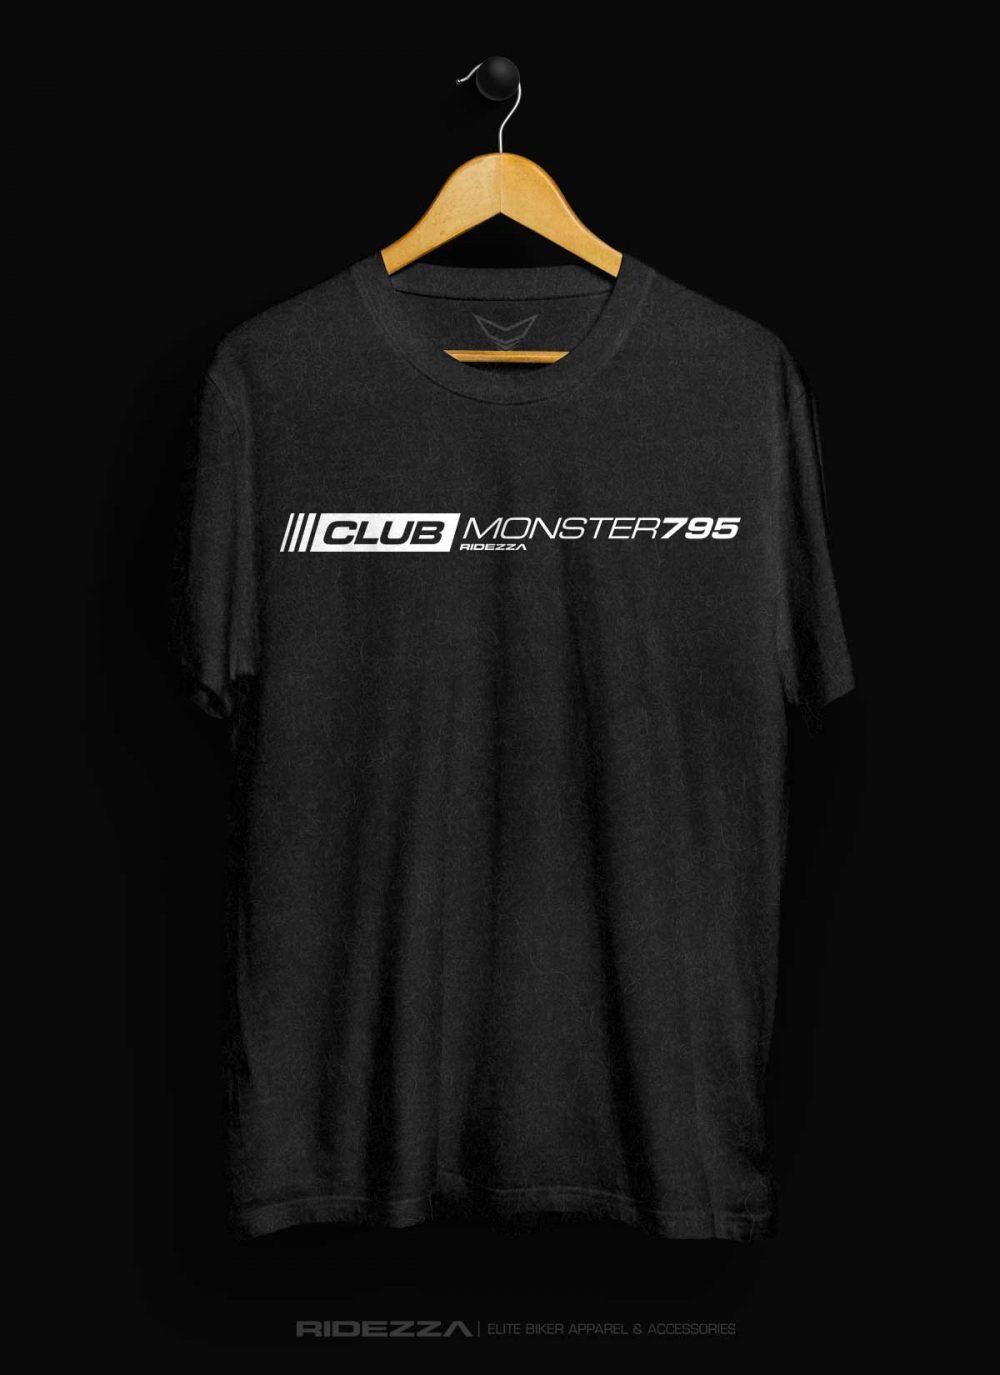 Ducati Monster 795 Club T-Shirt